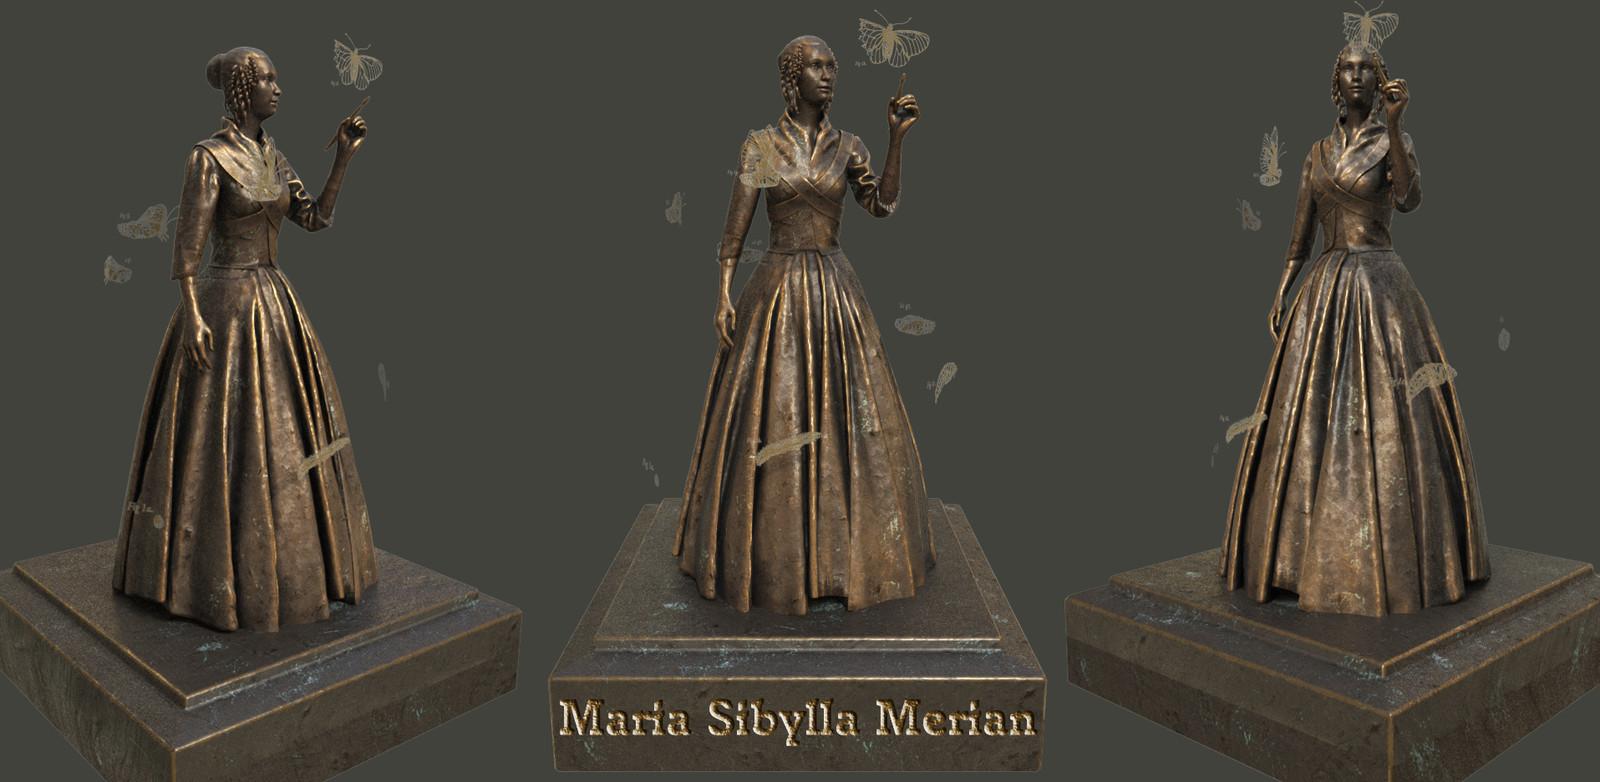 Maria Sibylla Merian, entomologist & scientific illustrator.